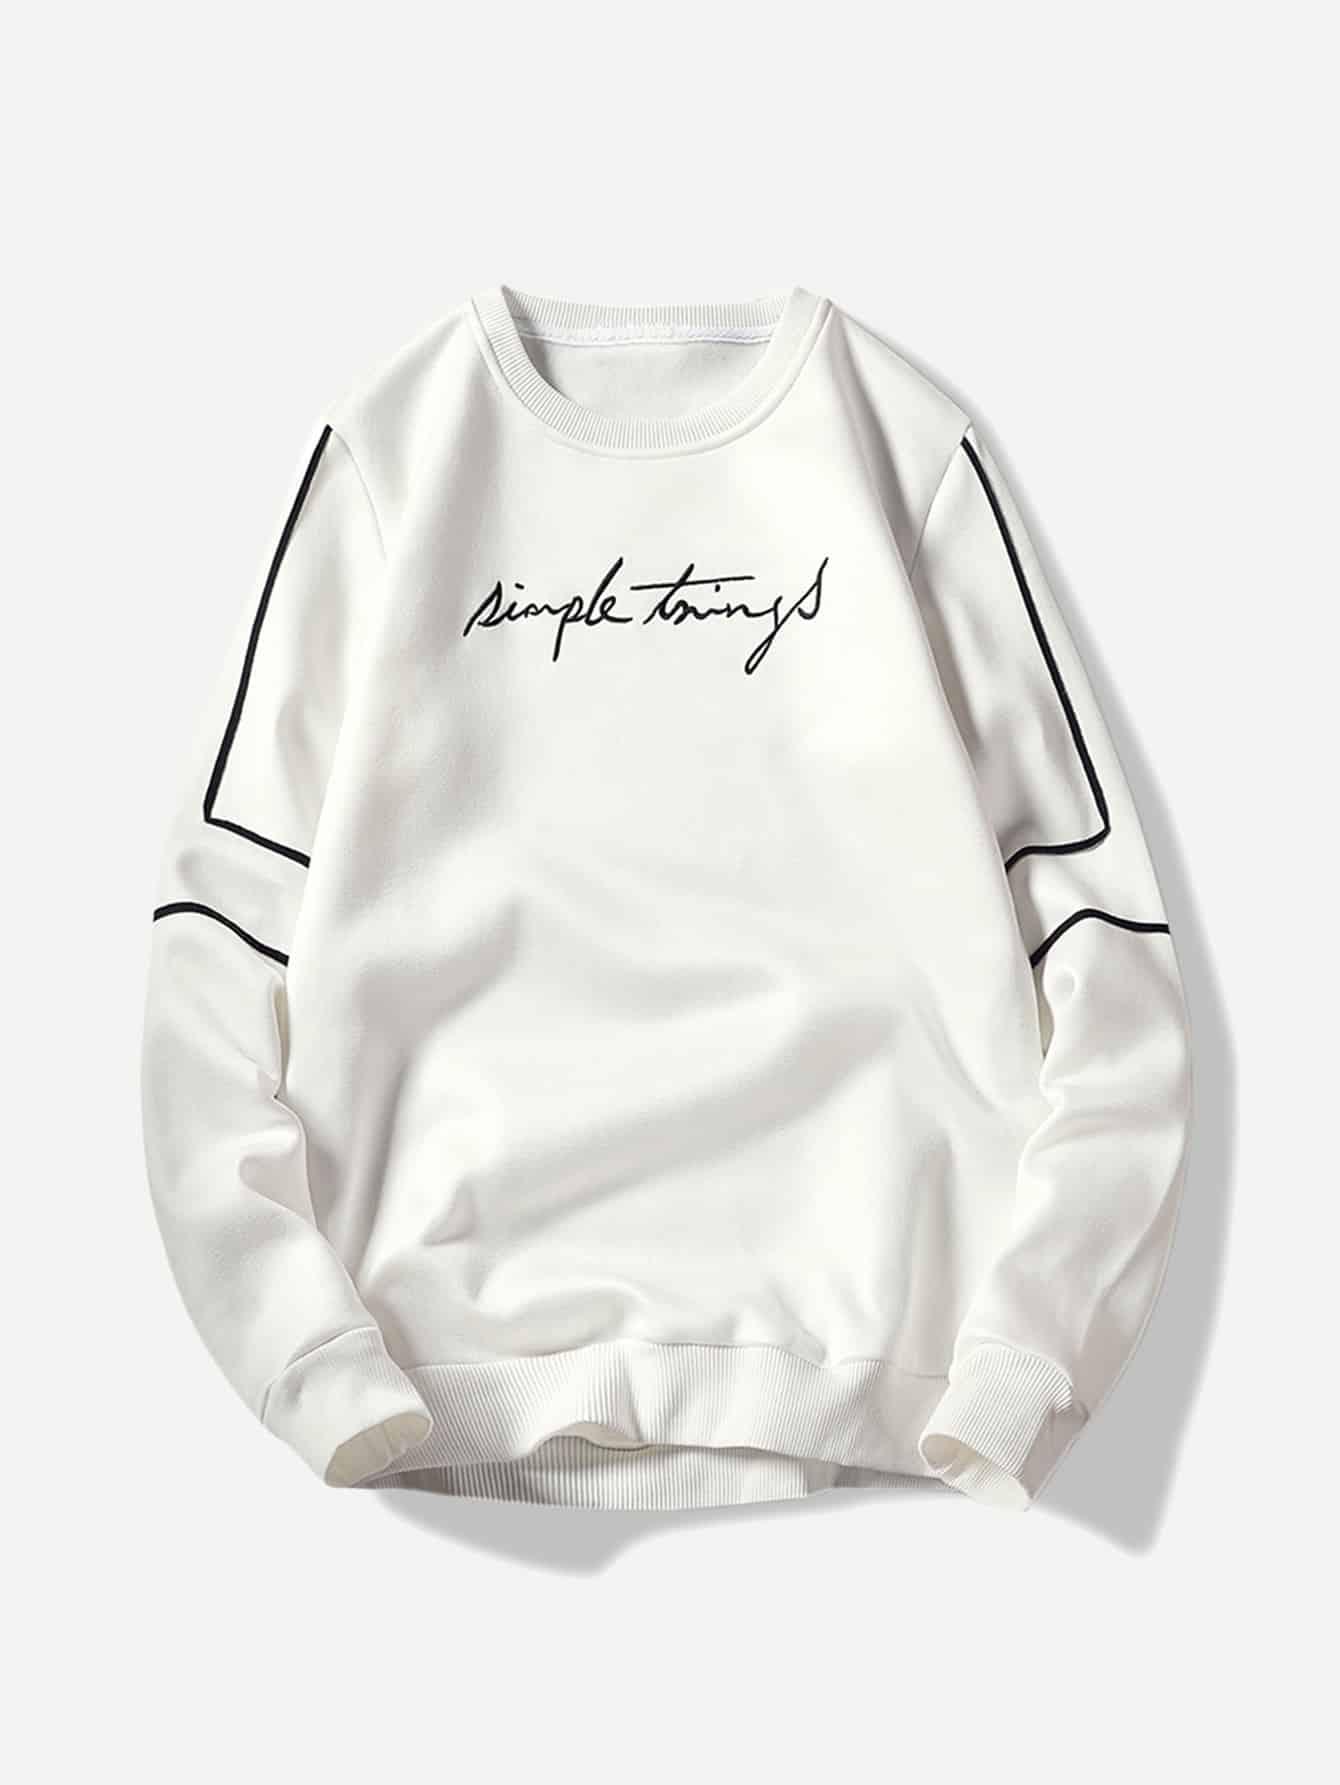 Men Embroidery Sweatshirt Men Embroidery Sweatshirt